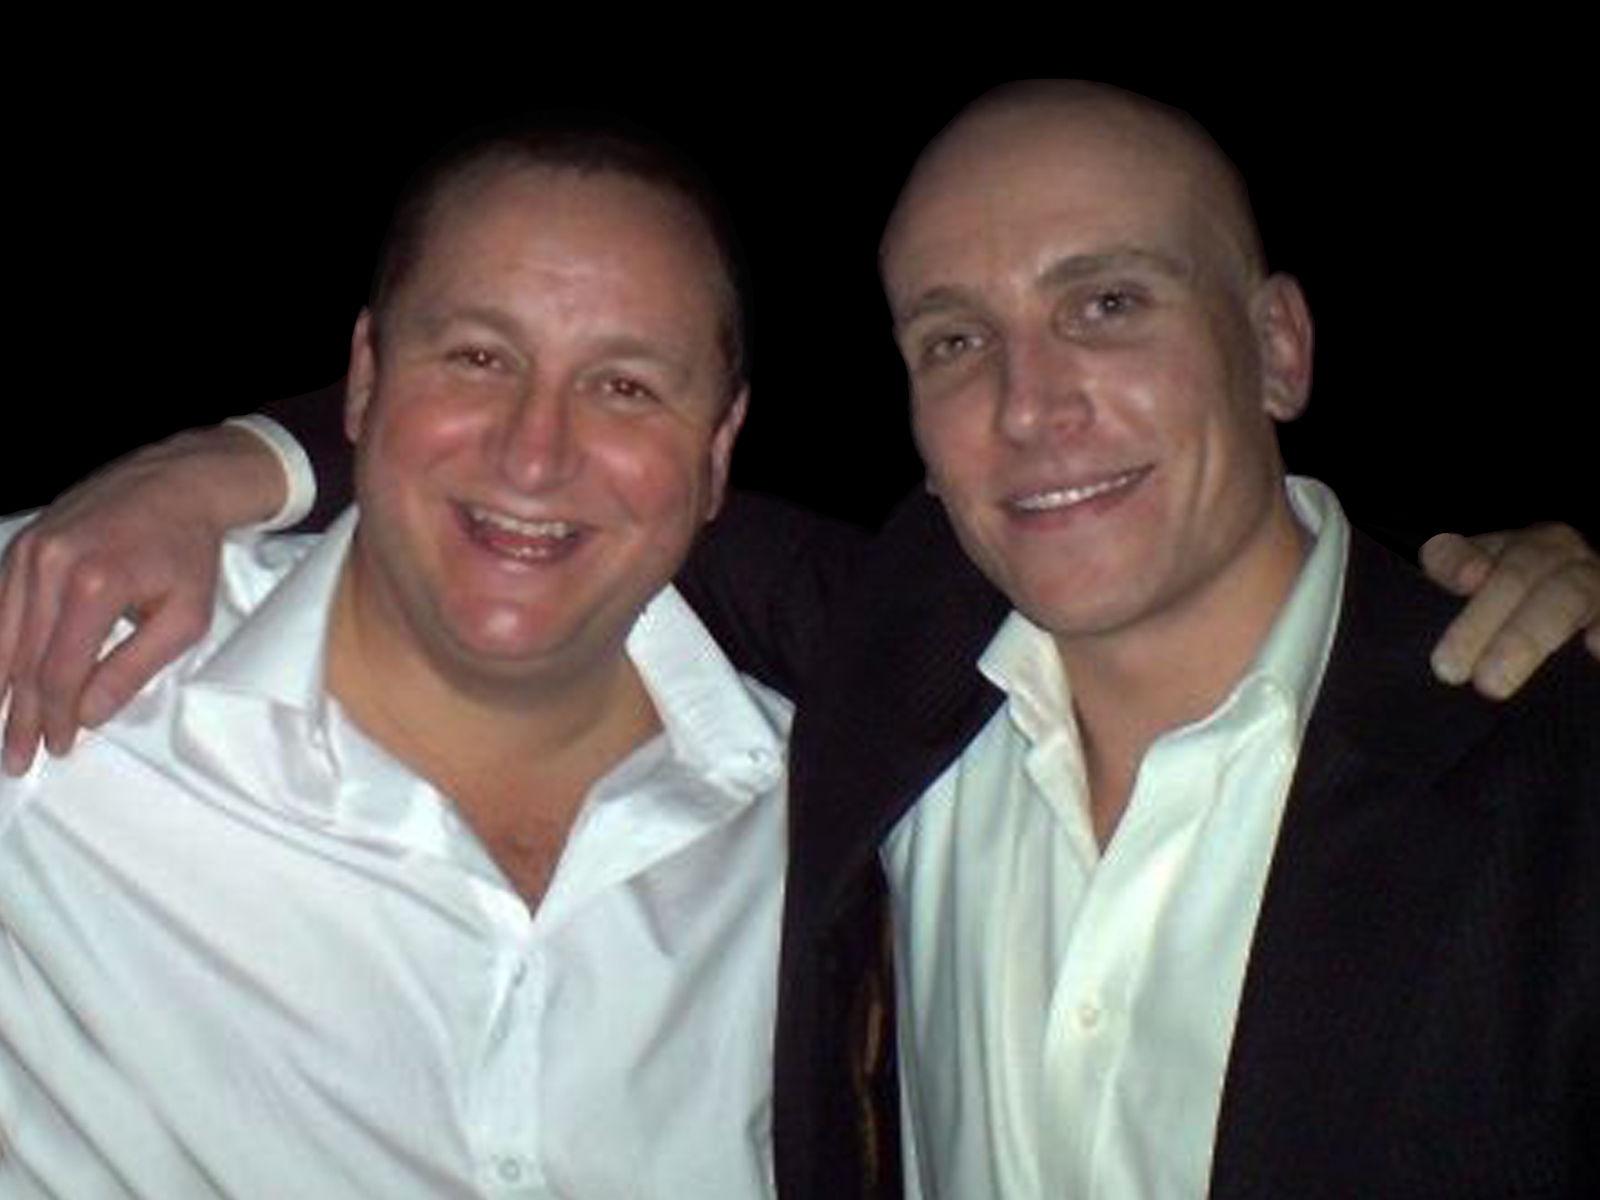 Photo of Mike Ashley (businessman): English billionaire retail entrepreneur/sporting goods market/owner of Newcastle United